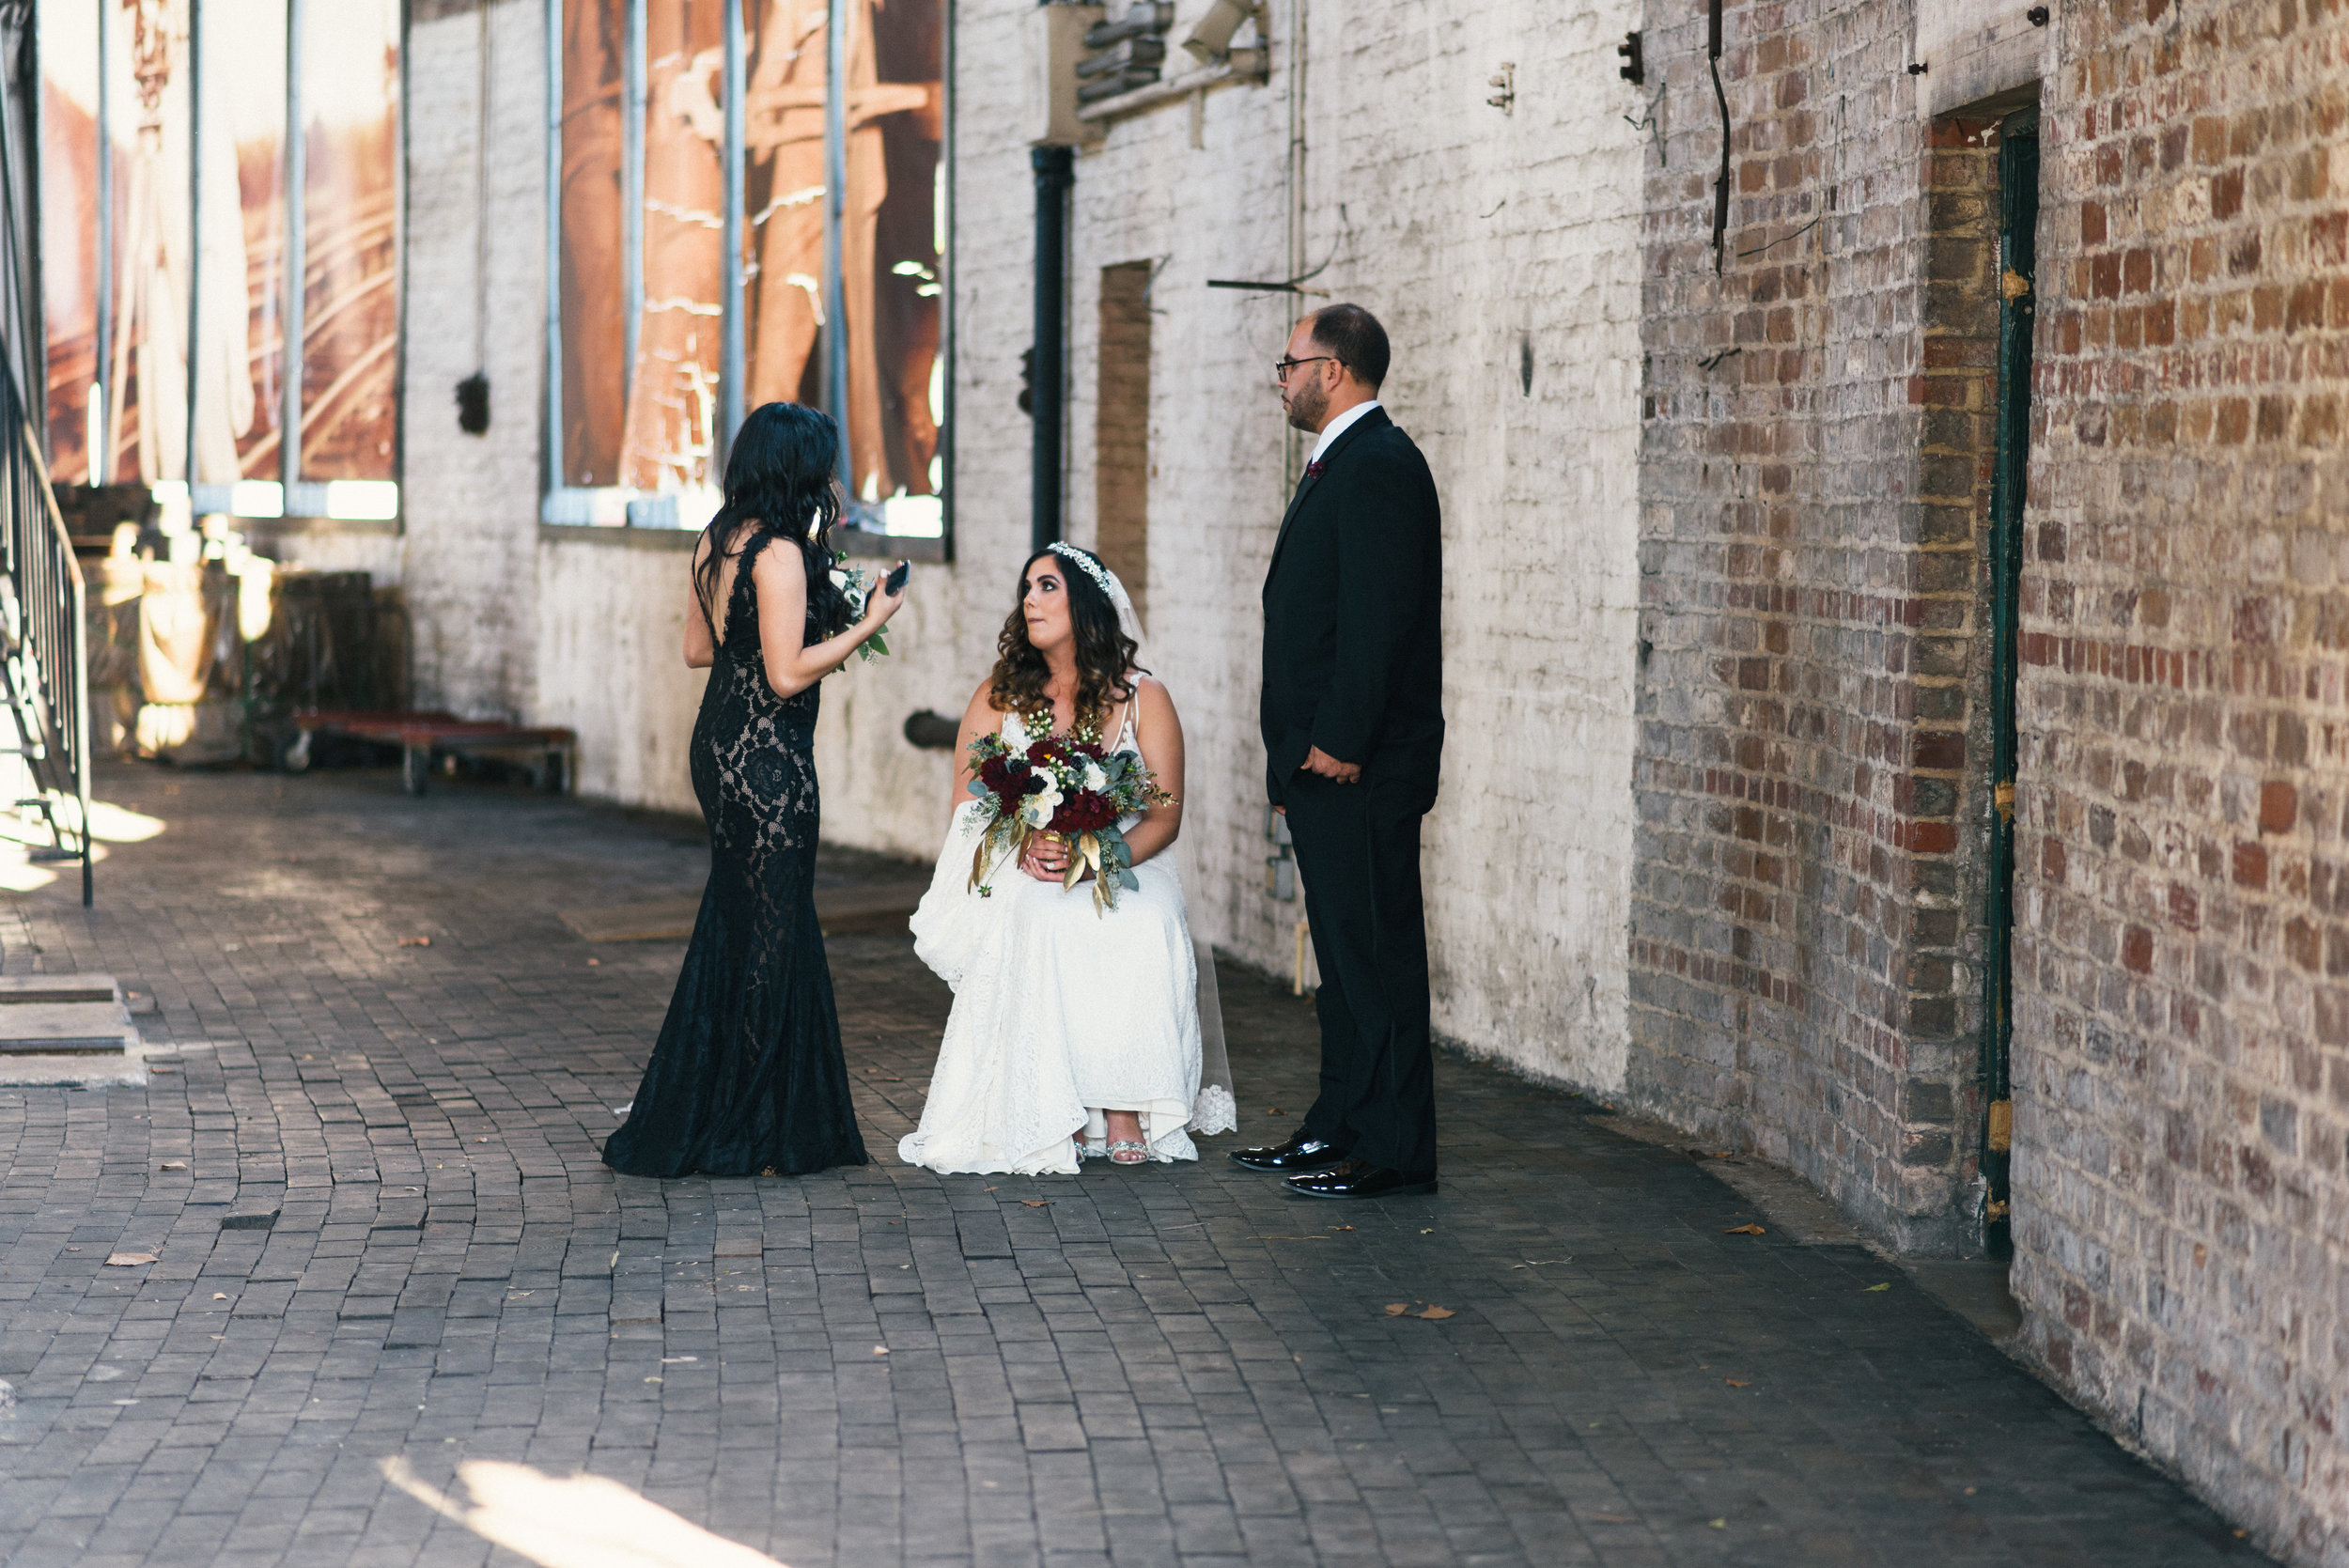 Iggy-and-yesenia-savannah-railroad-museum-wedding-meg-hill-photo- (397 of 1037).jpg